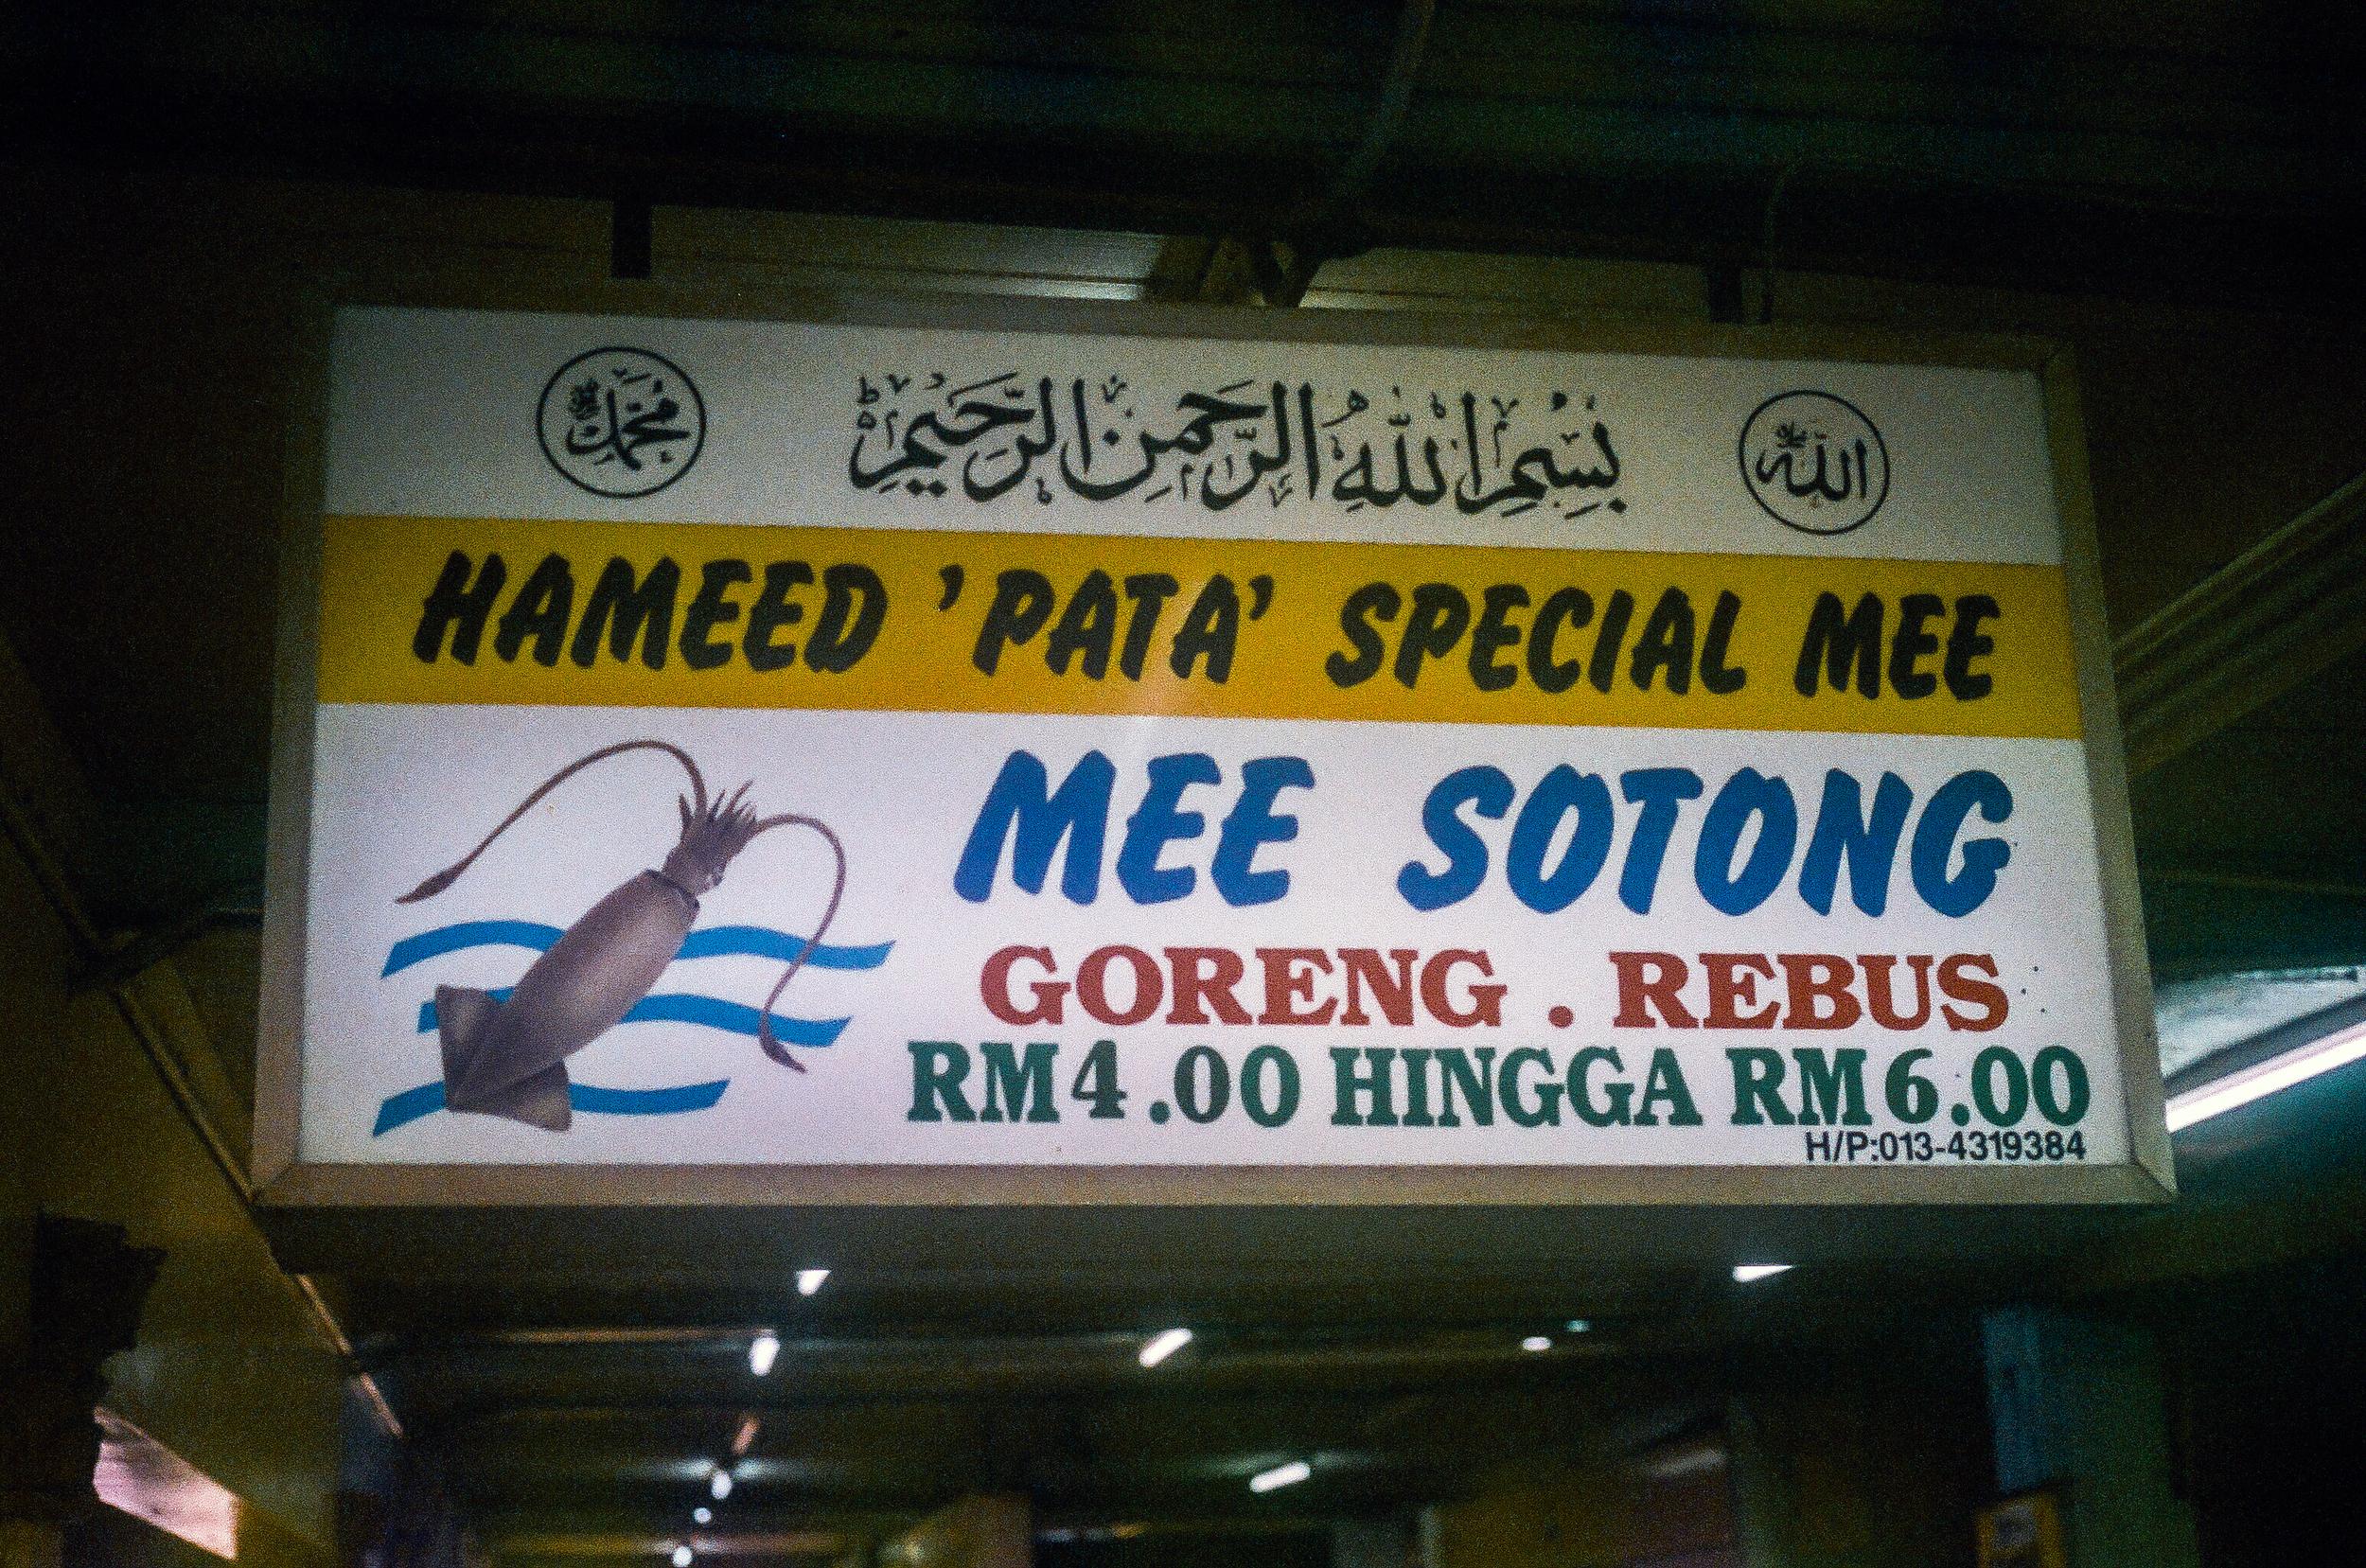 Asia Film Mee Sotong.jpg